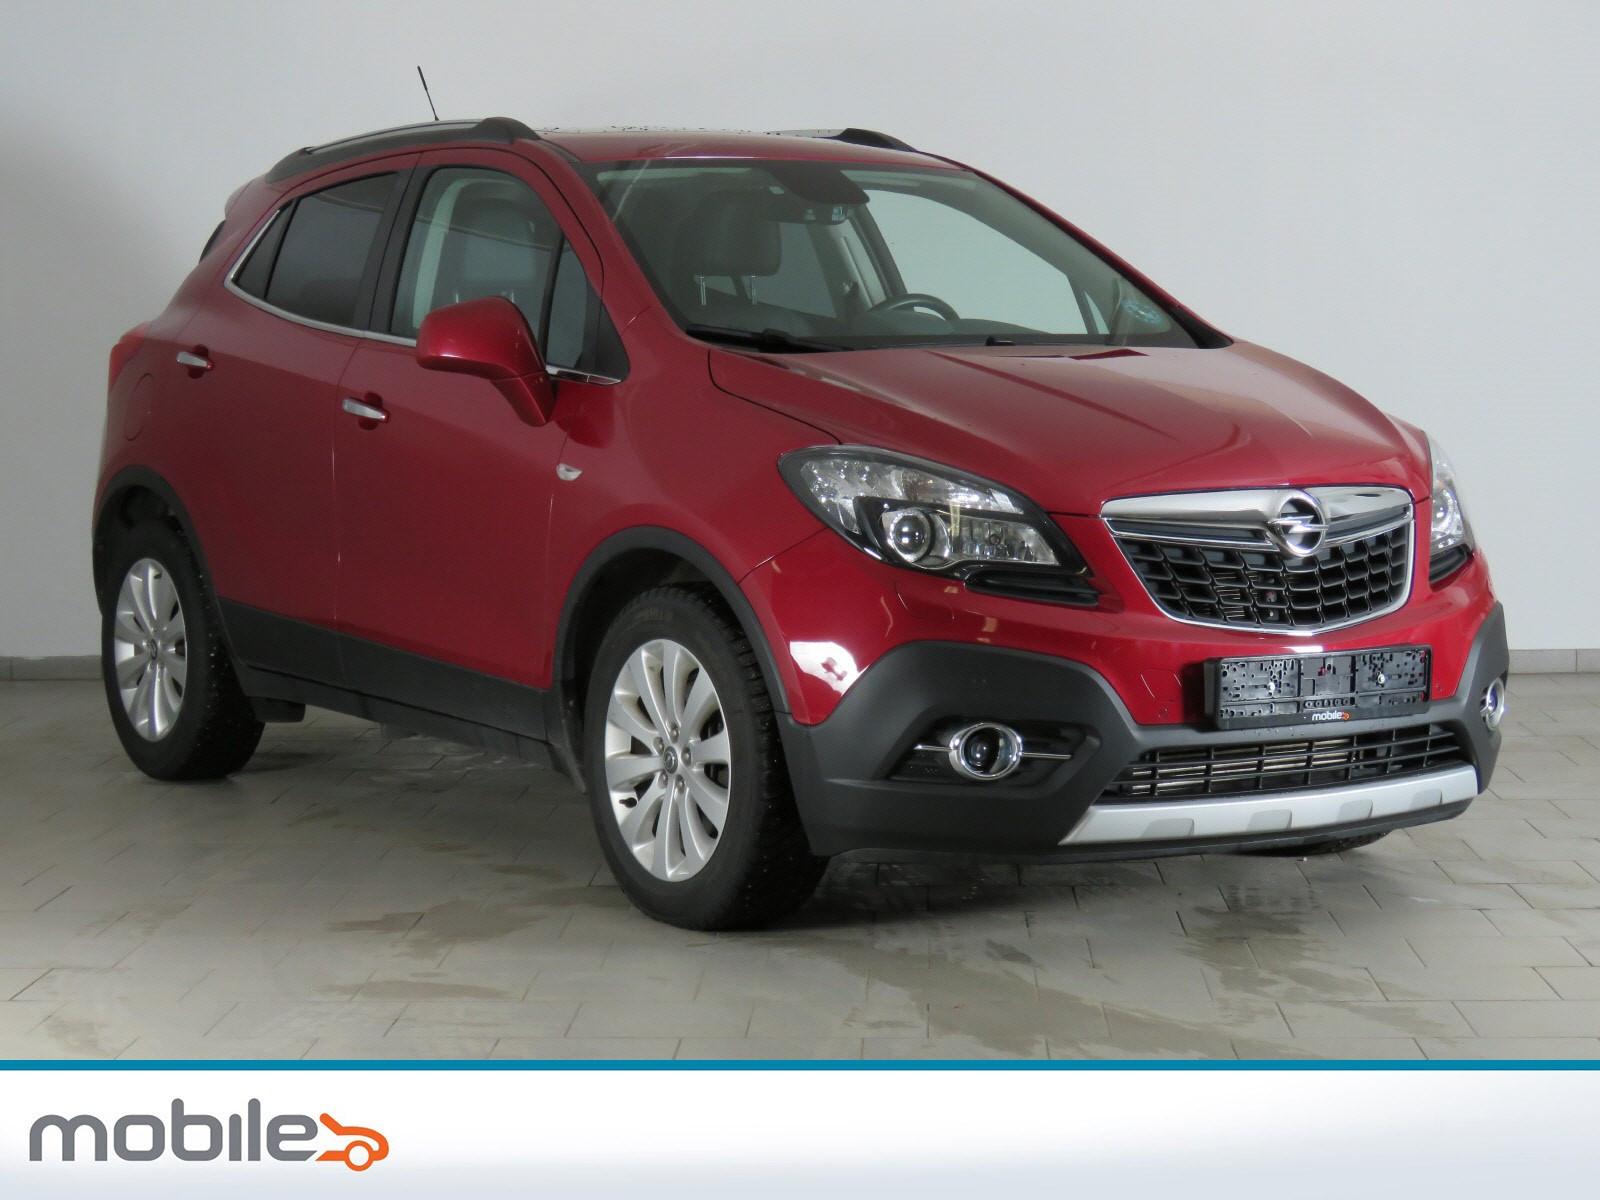 Opel Mokka – Mobile